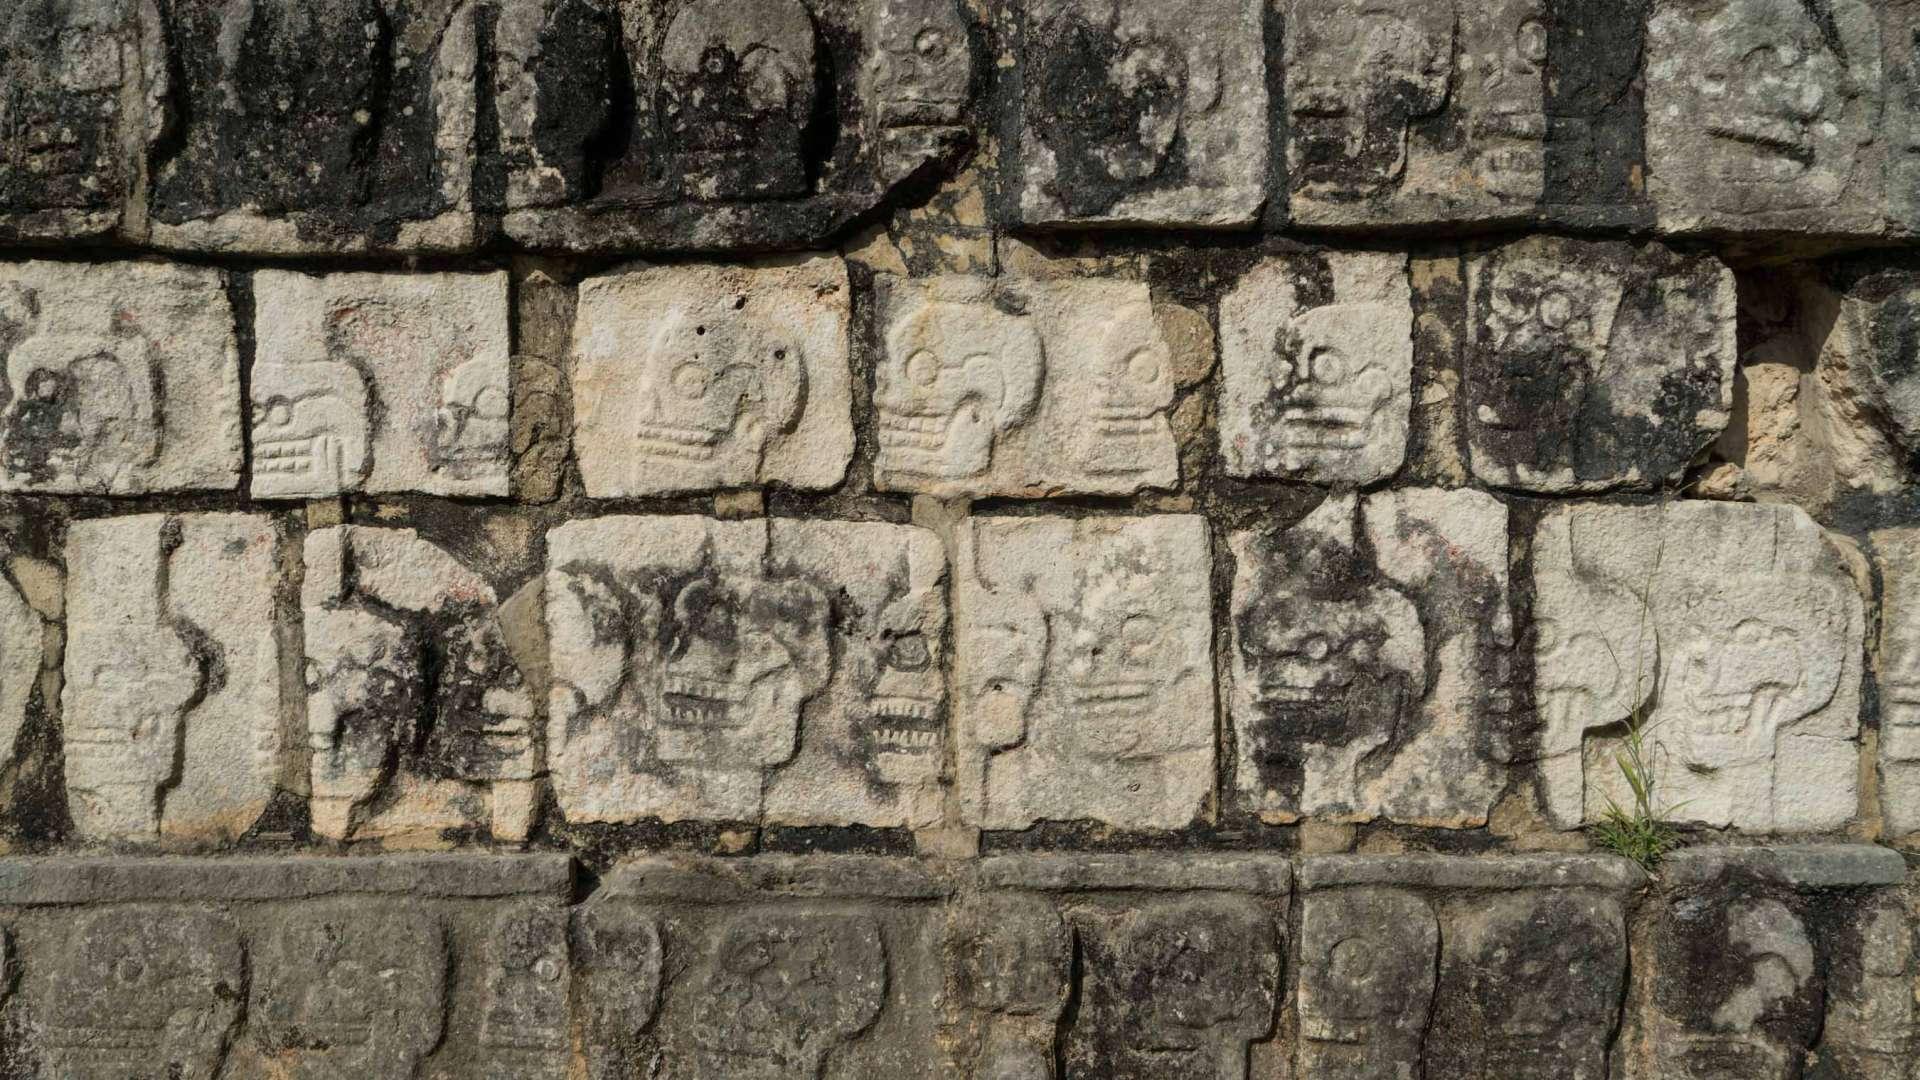 toltec sculptures in chichen itza